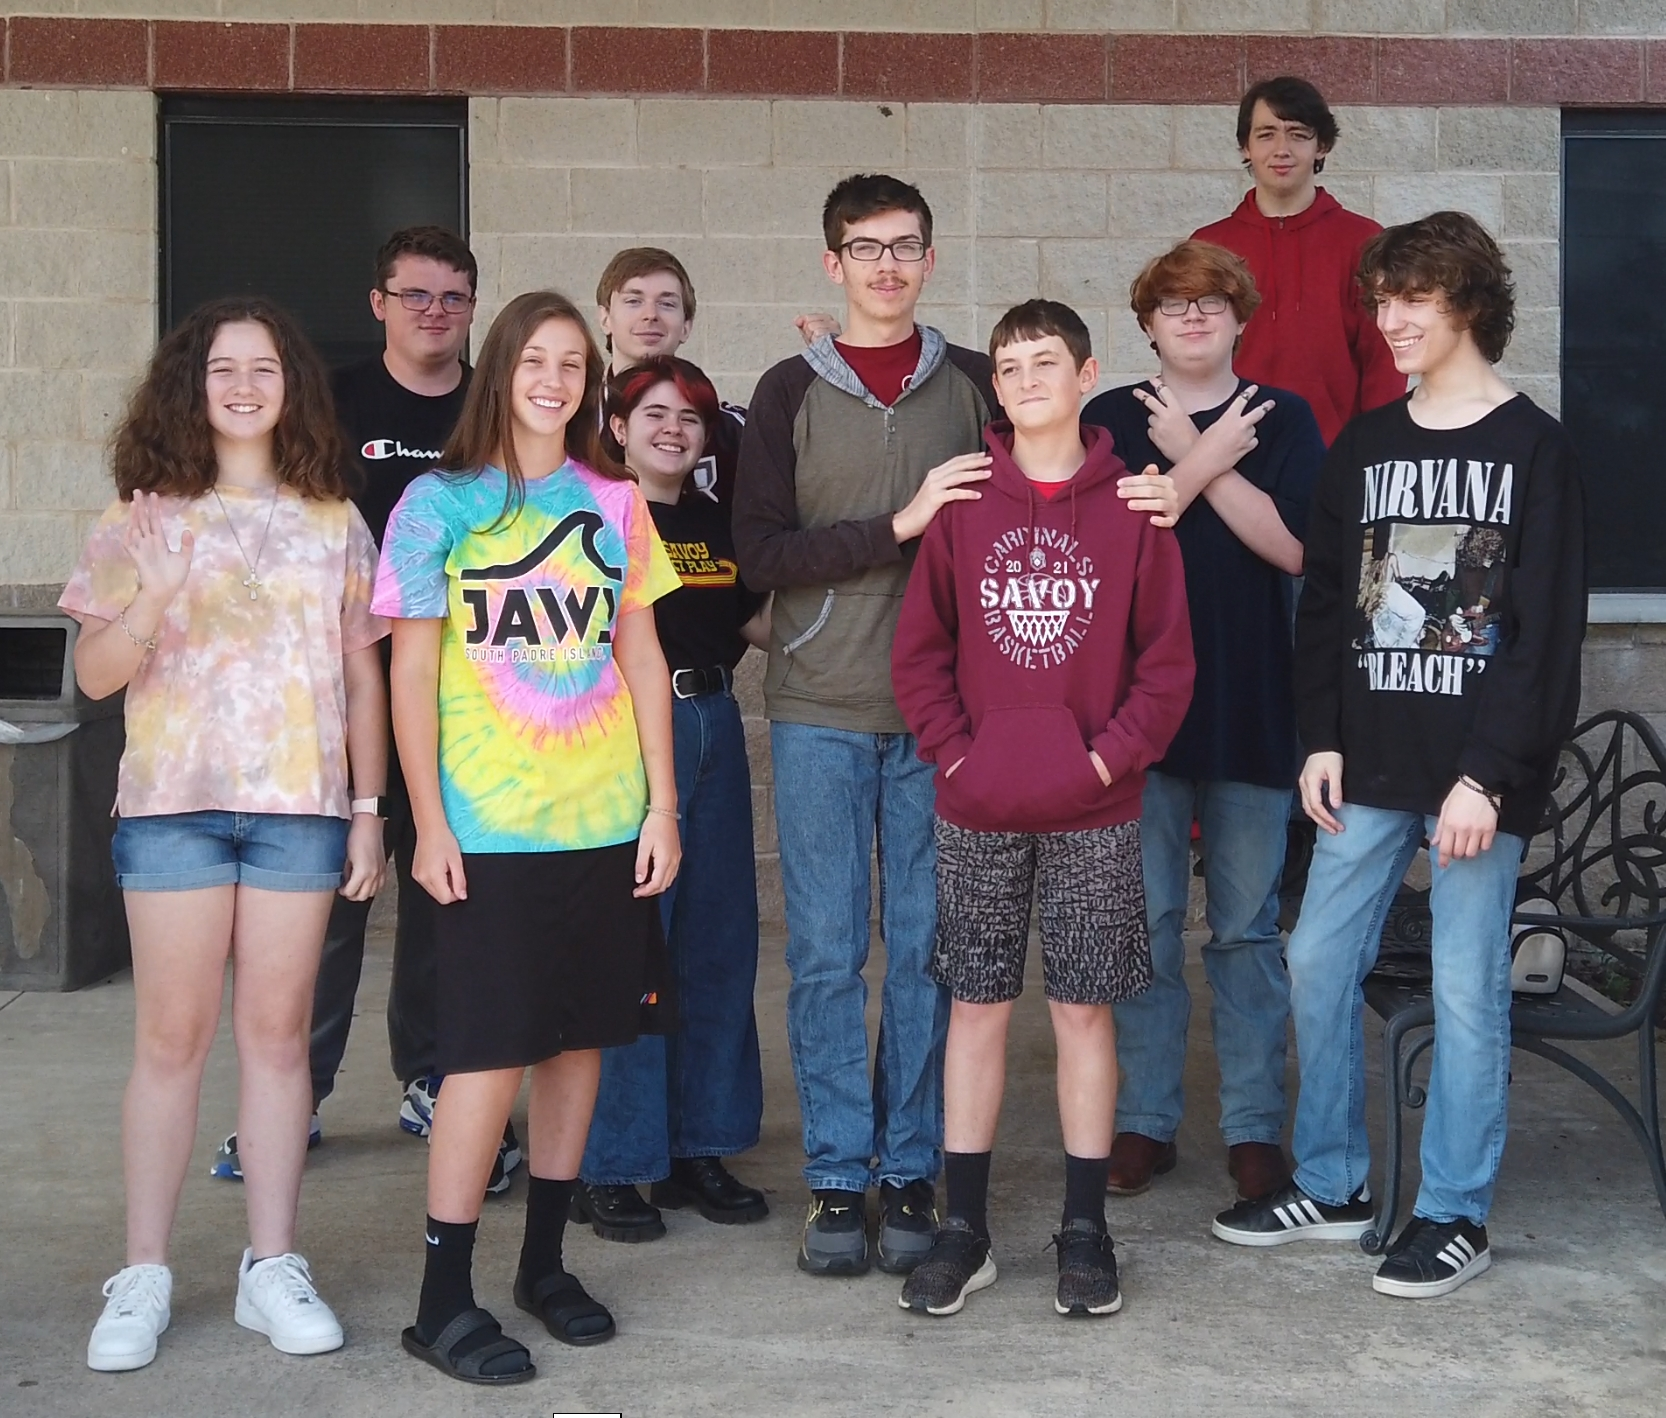 Video Tech Students